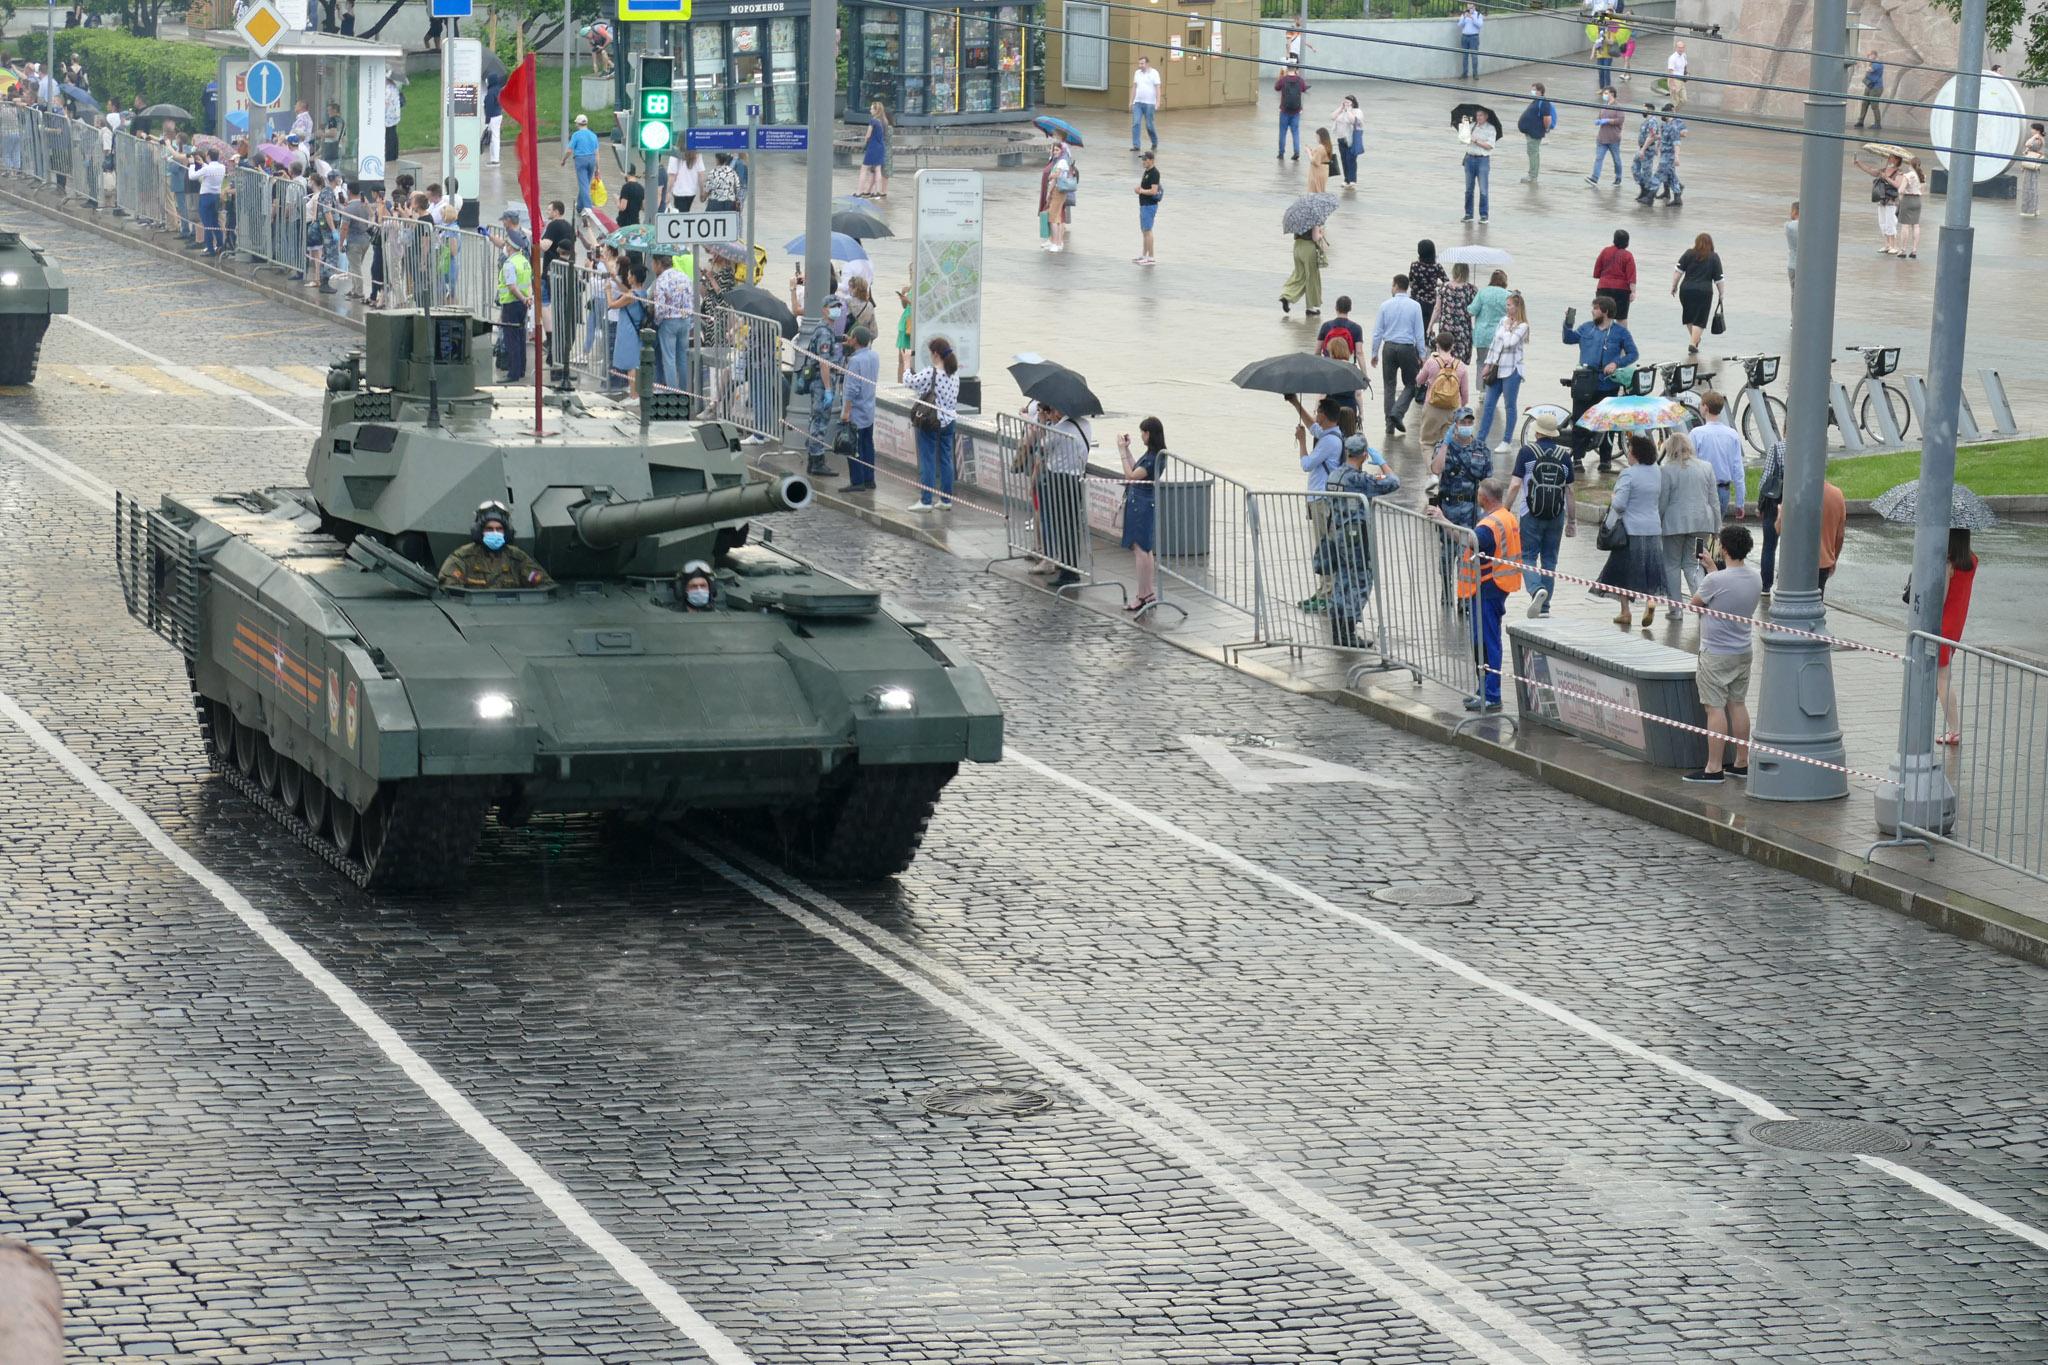 https://ic.pics.livejournal.com/yuripasholok/765139/16585635/16585635_original.jpg